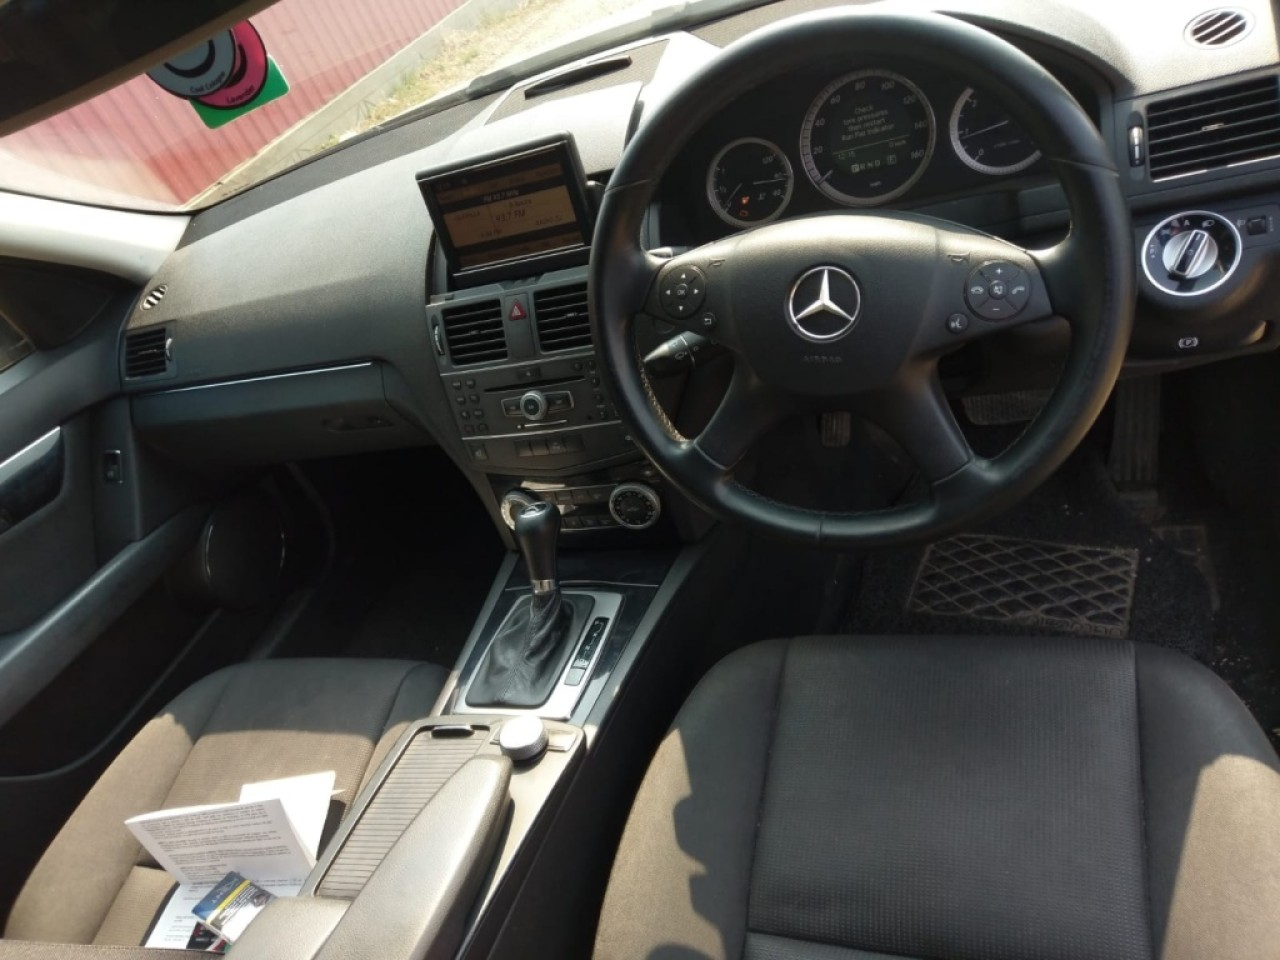 Rezervor Mercedes C-Class W204 2011 Berlina 2.2 cdi om 651